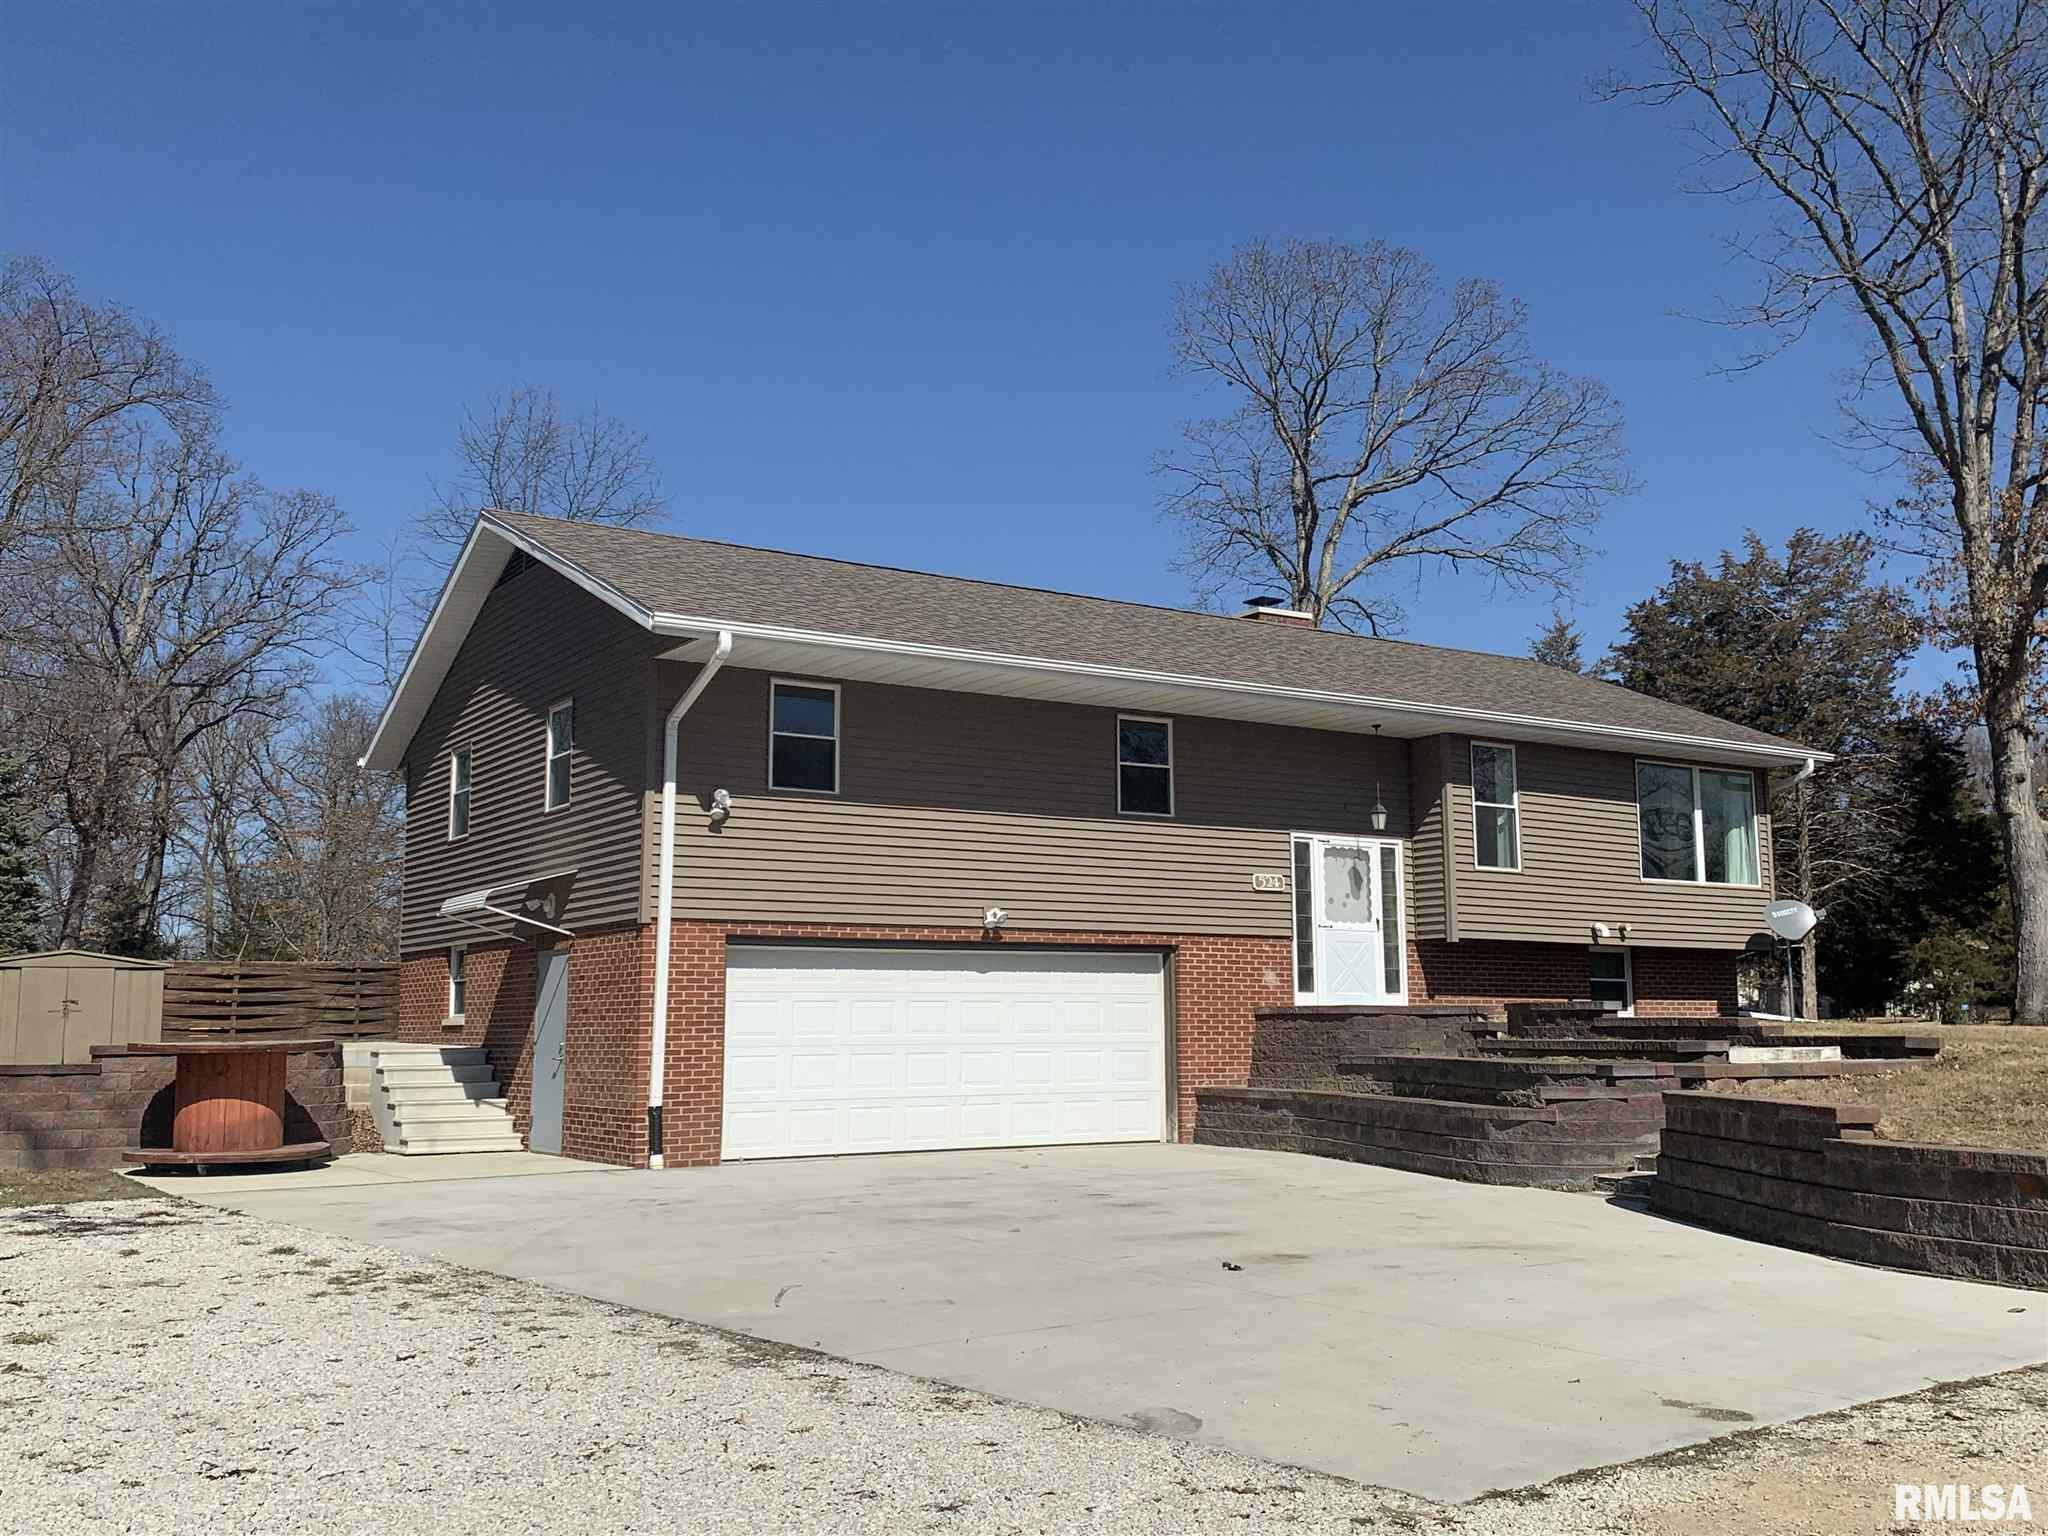 524 CEDAR Property Photo - Metamora, IL real estate listing